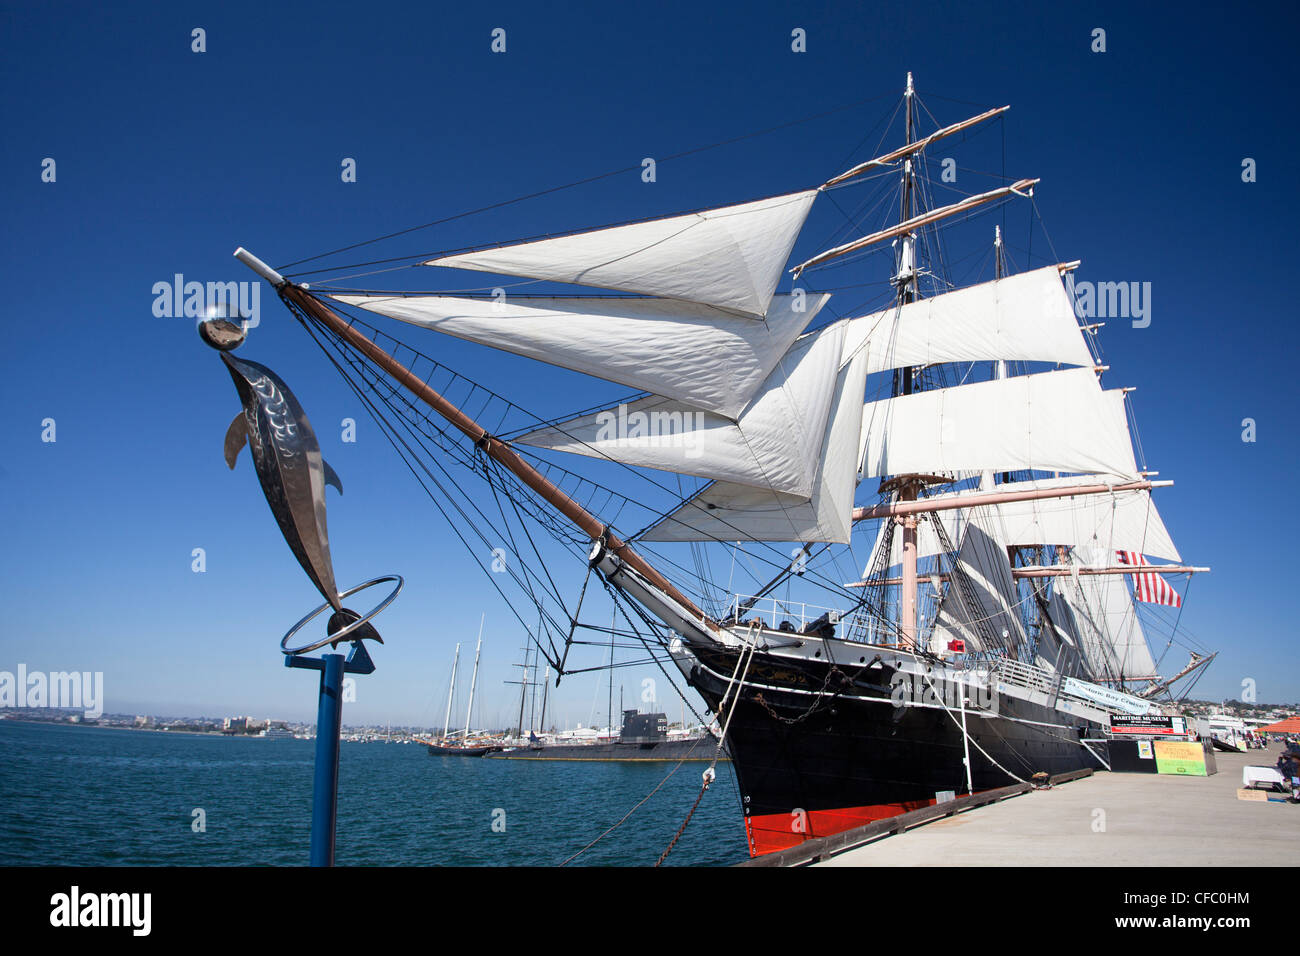 USA, USA, Amerika, Kalifornien, San Diego, Stadt, Schifffahrtsmuseum, Segelboot, The Star of India., Stockbild